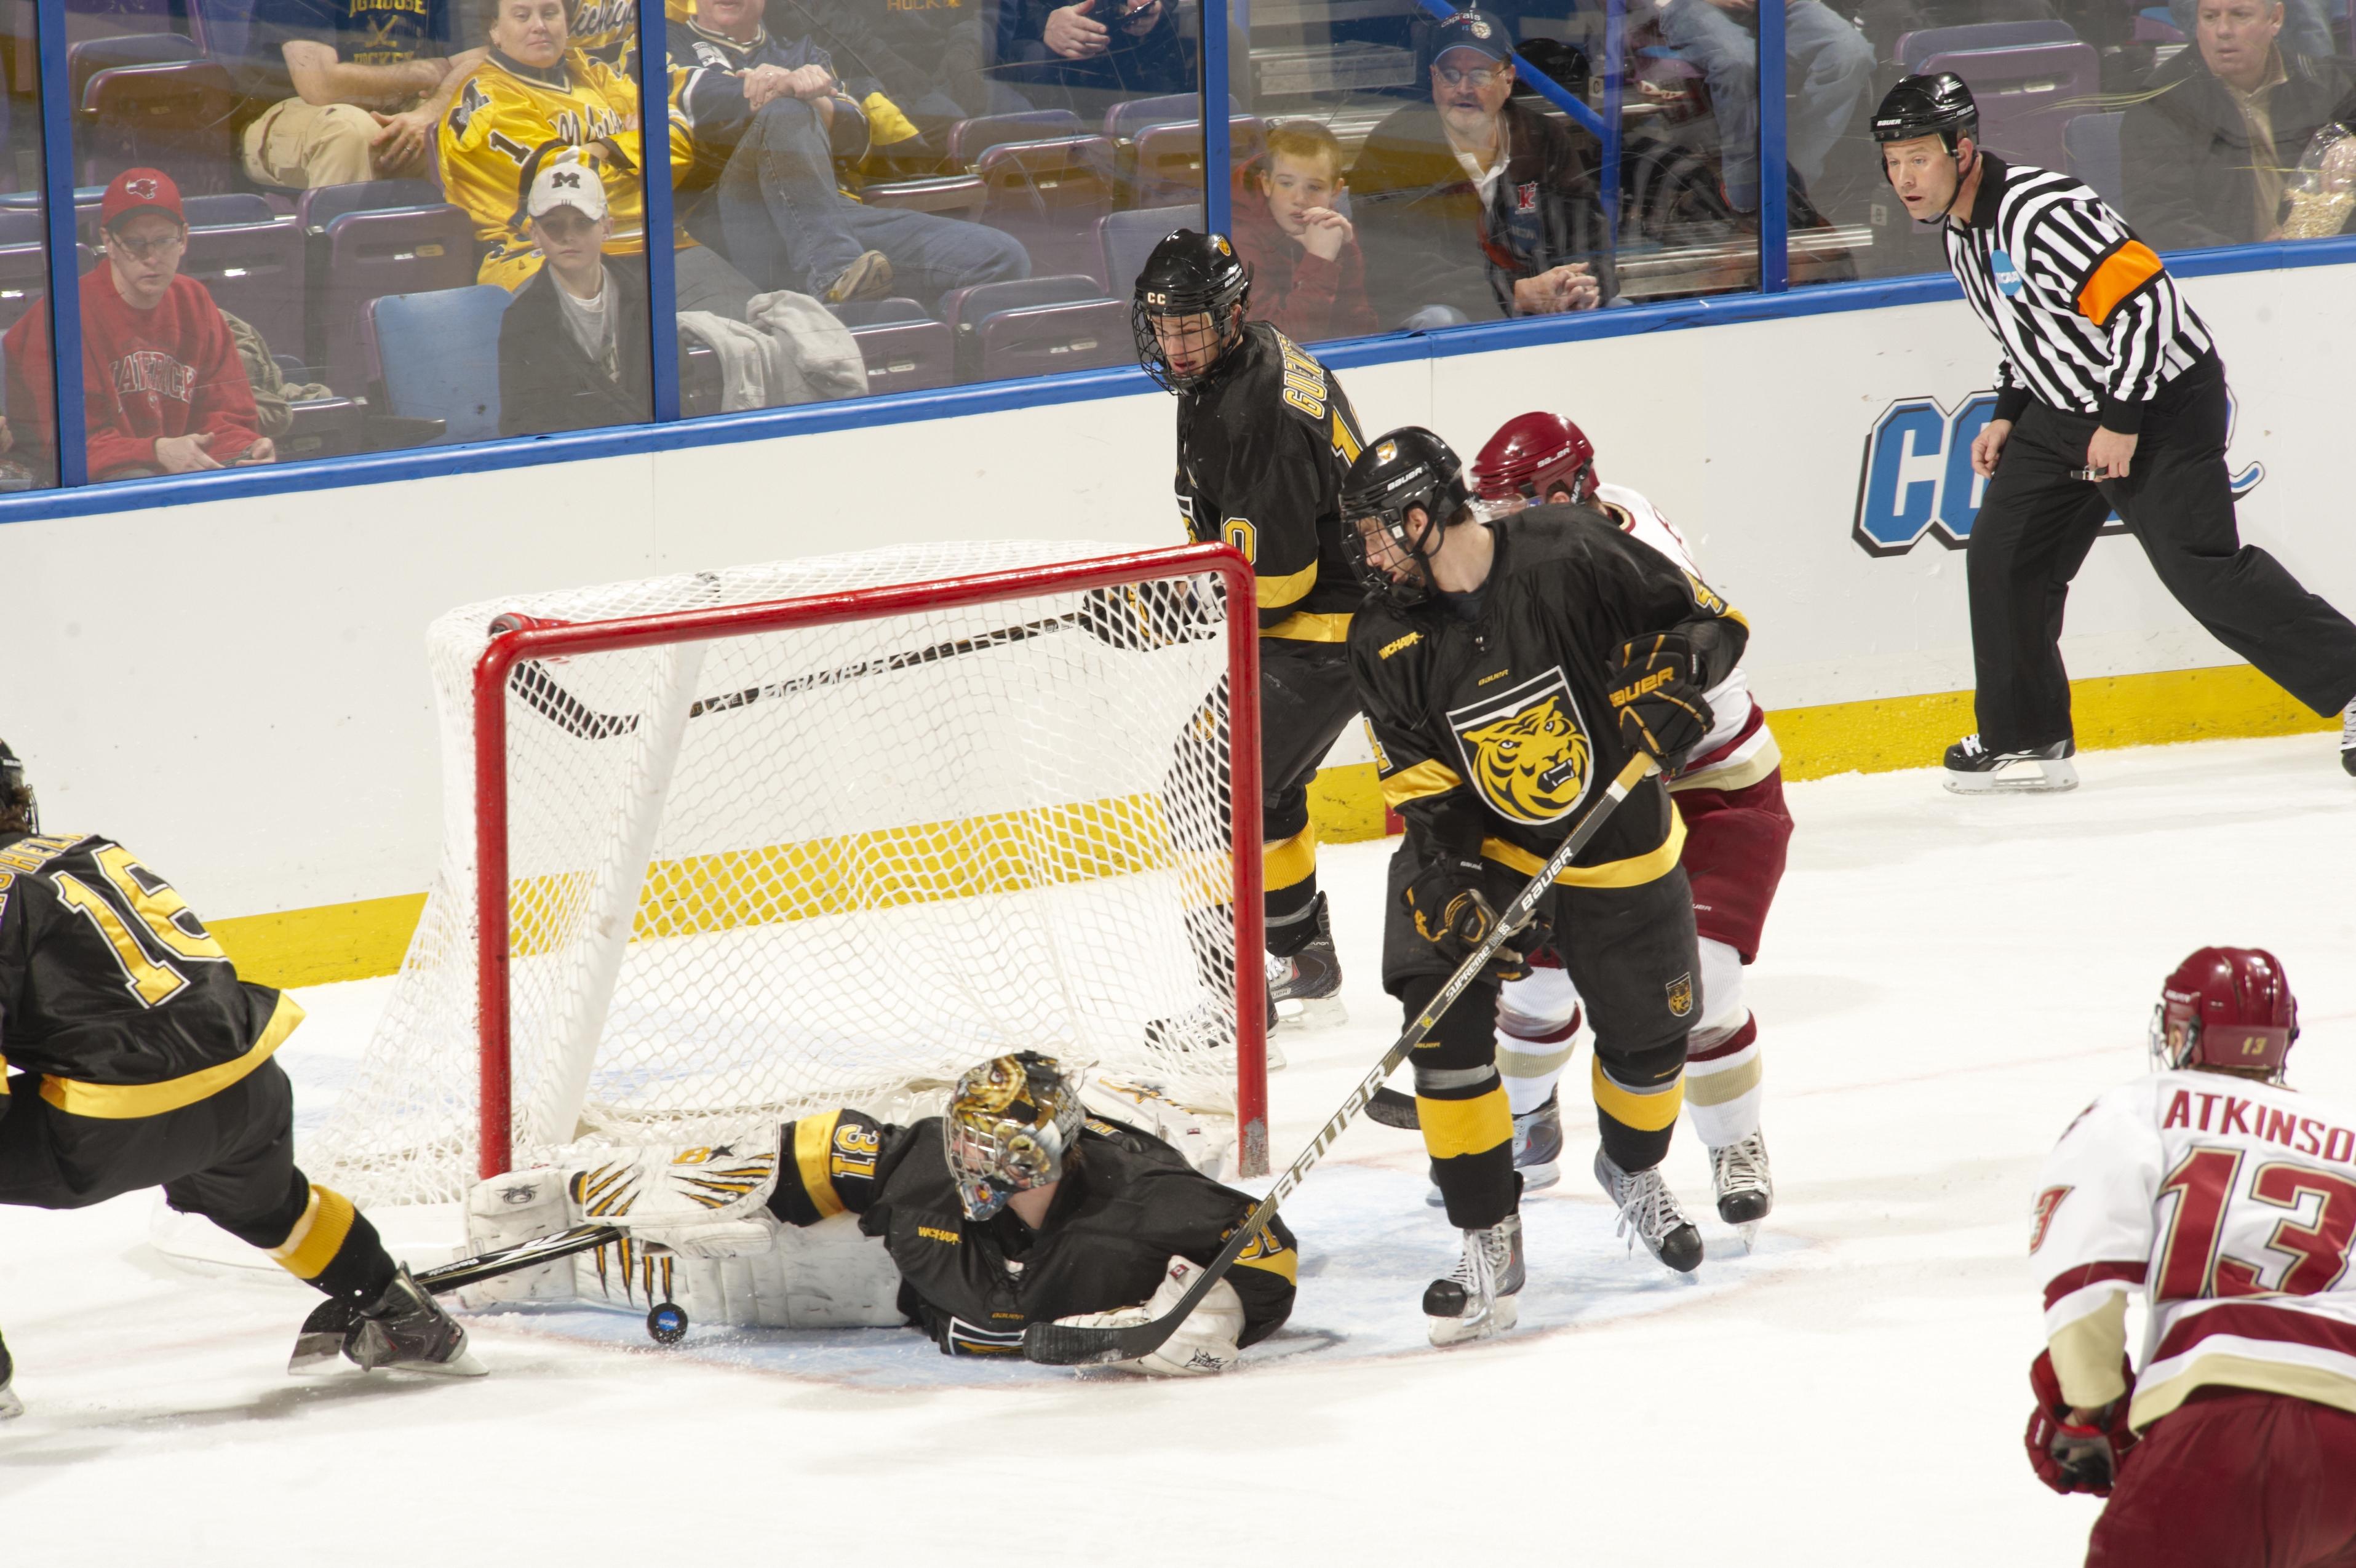 Boston College vs Colorado College, 2011 NCAA Men's Division I Ice Hockey West Regional Semifinals